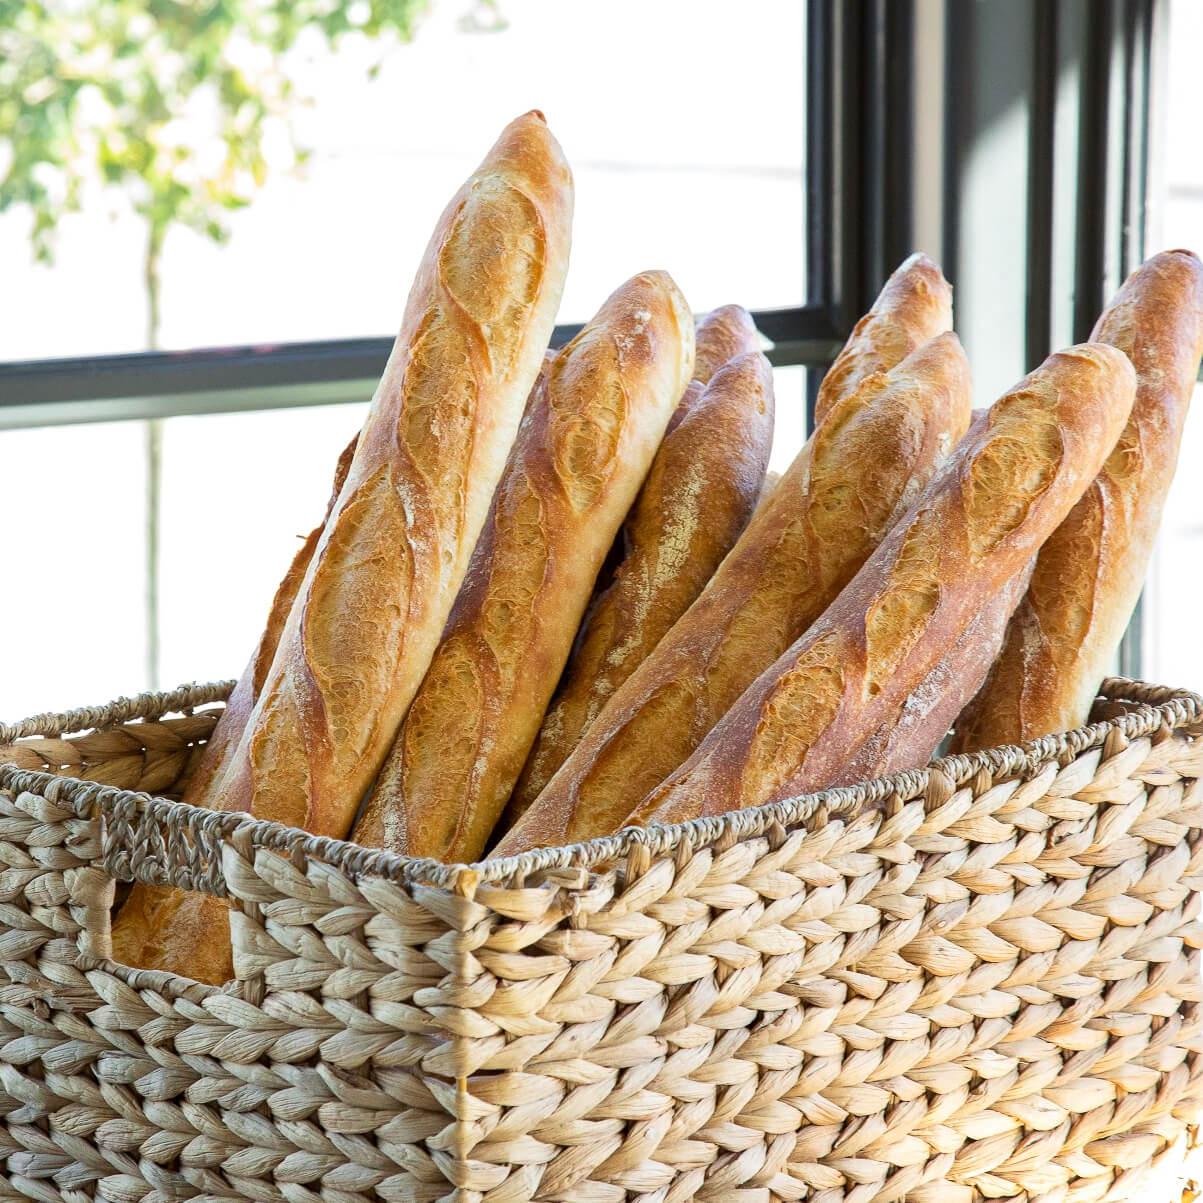 Celtica Bakery - Breads